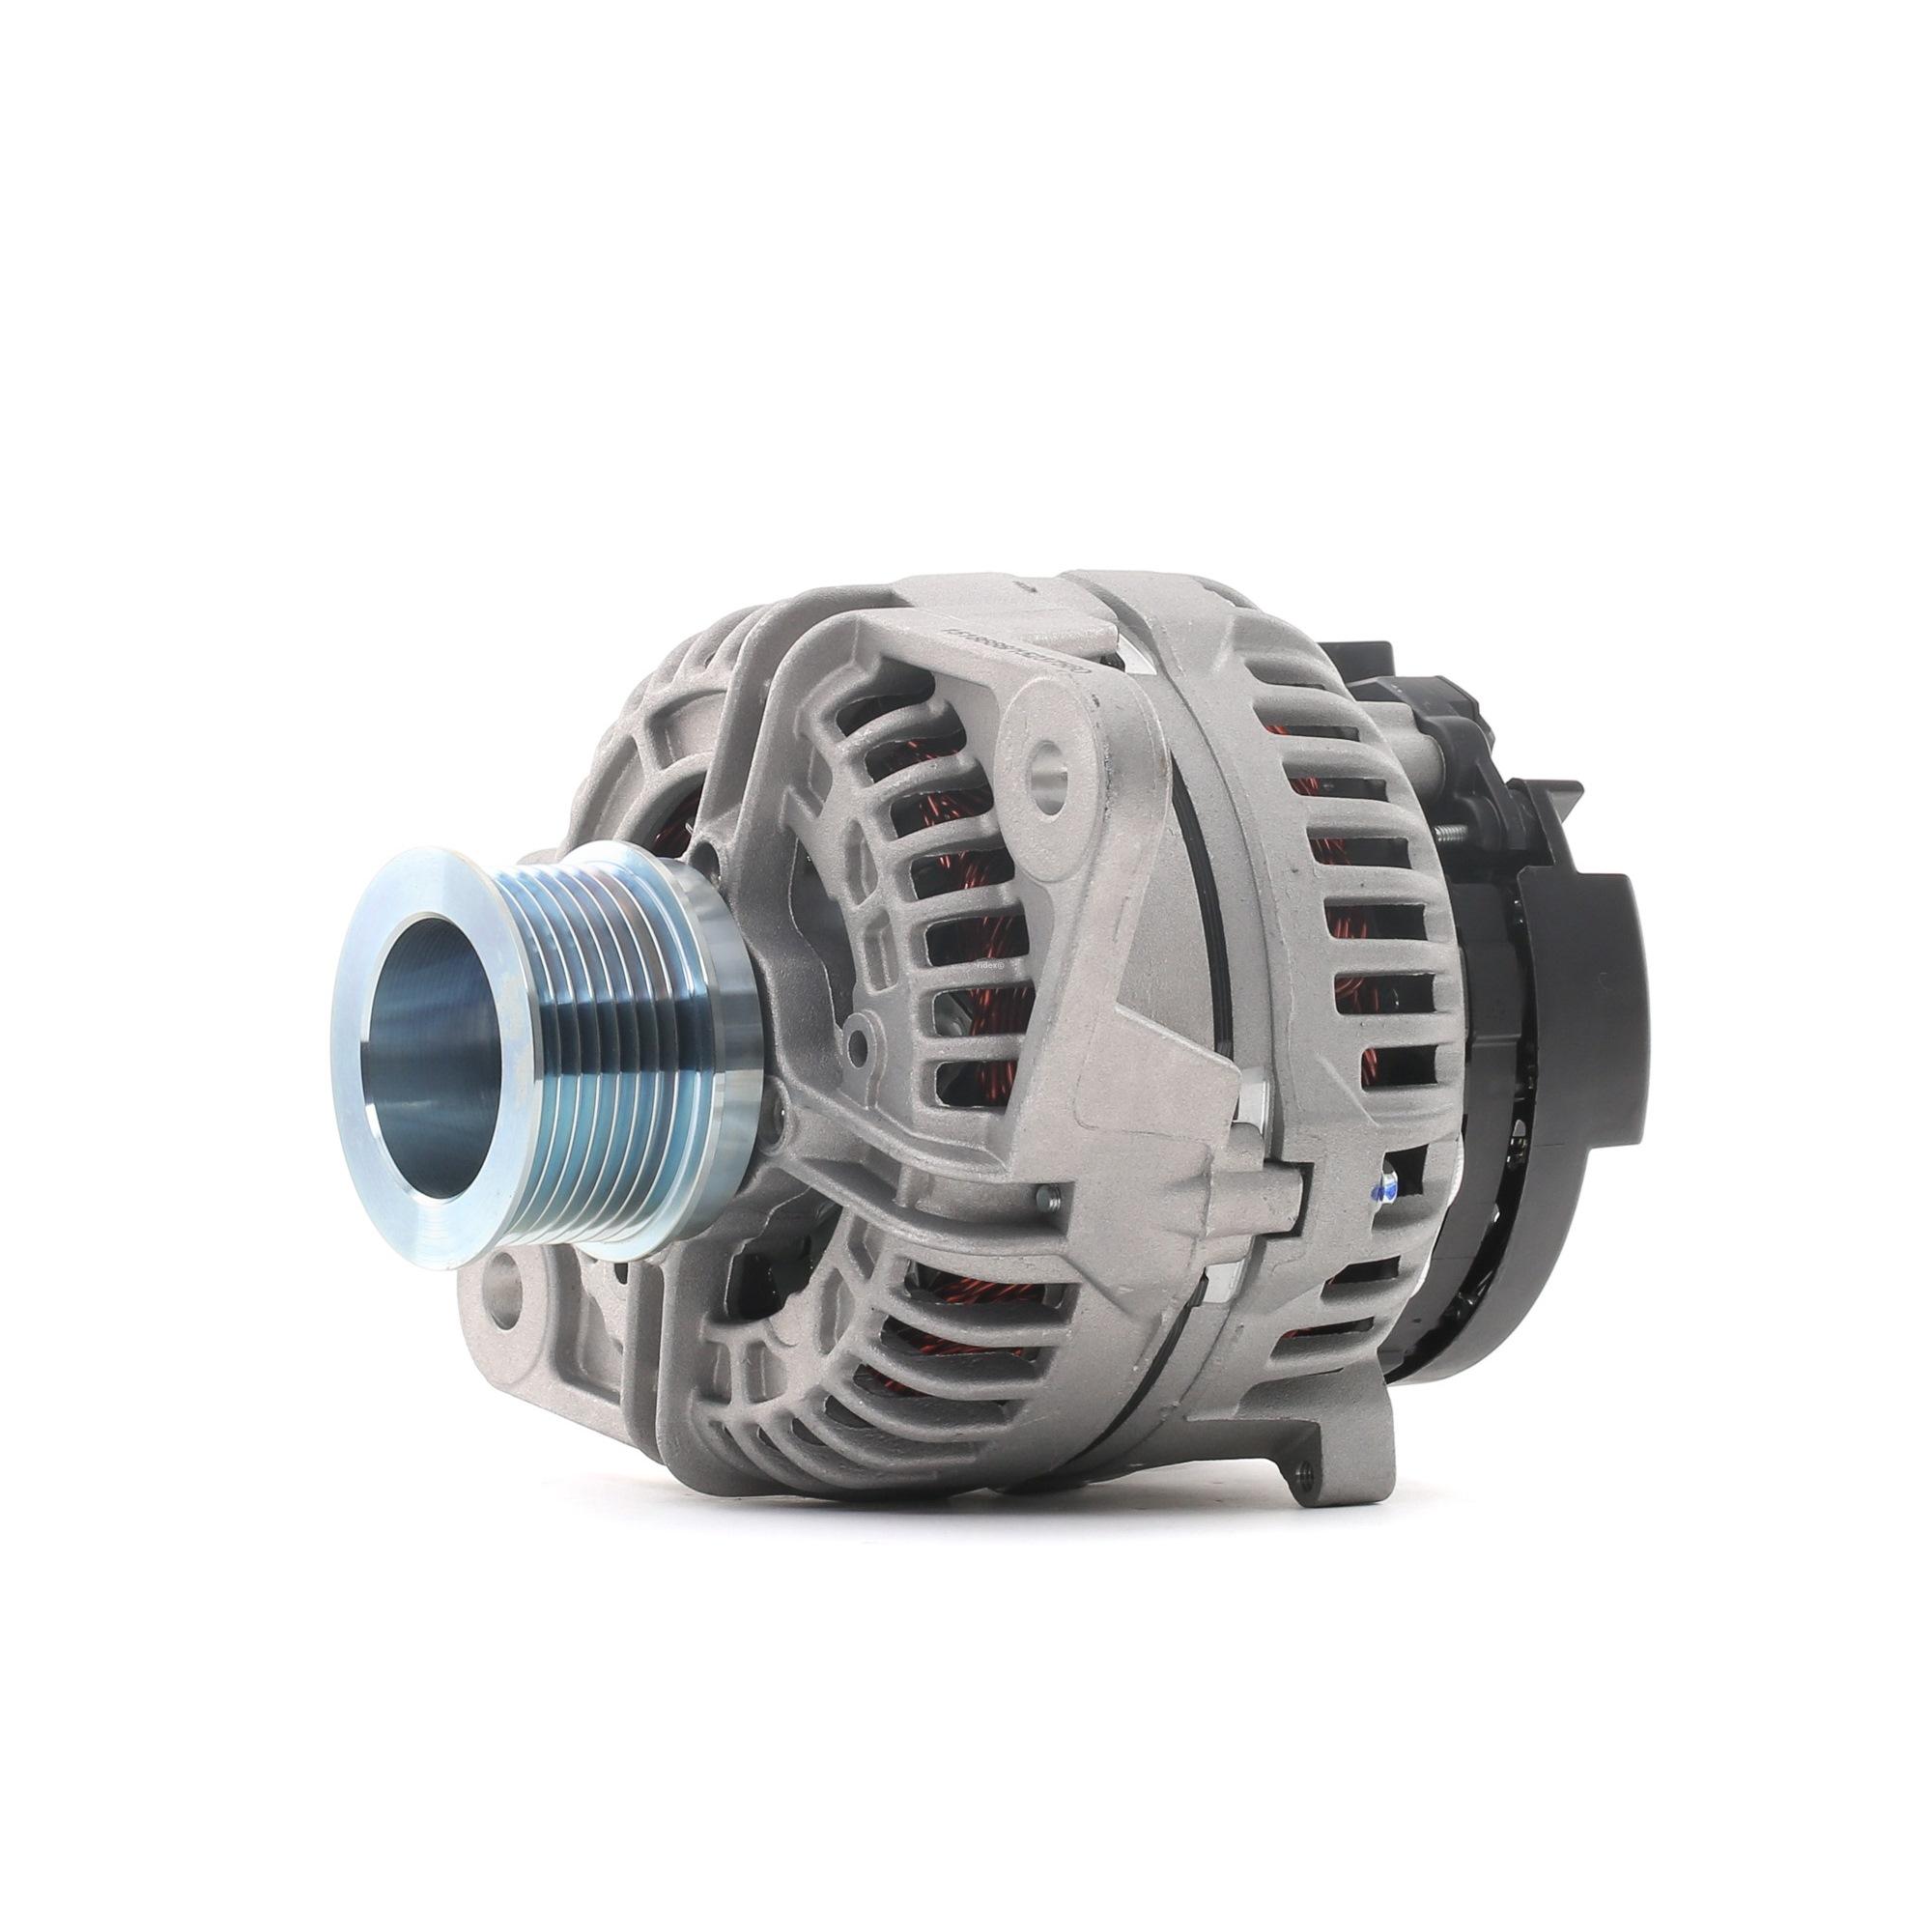 RIDEX Alternator do VOLVO - numer produktu: 4G1063